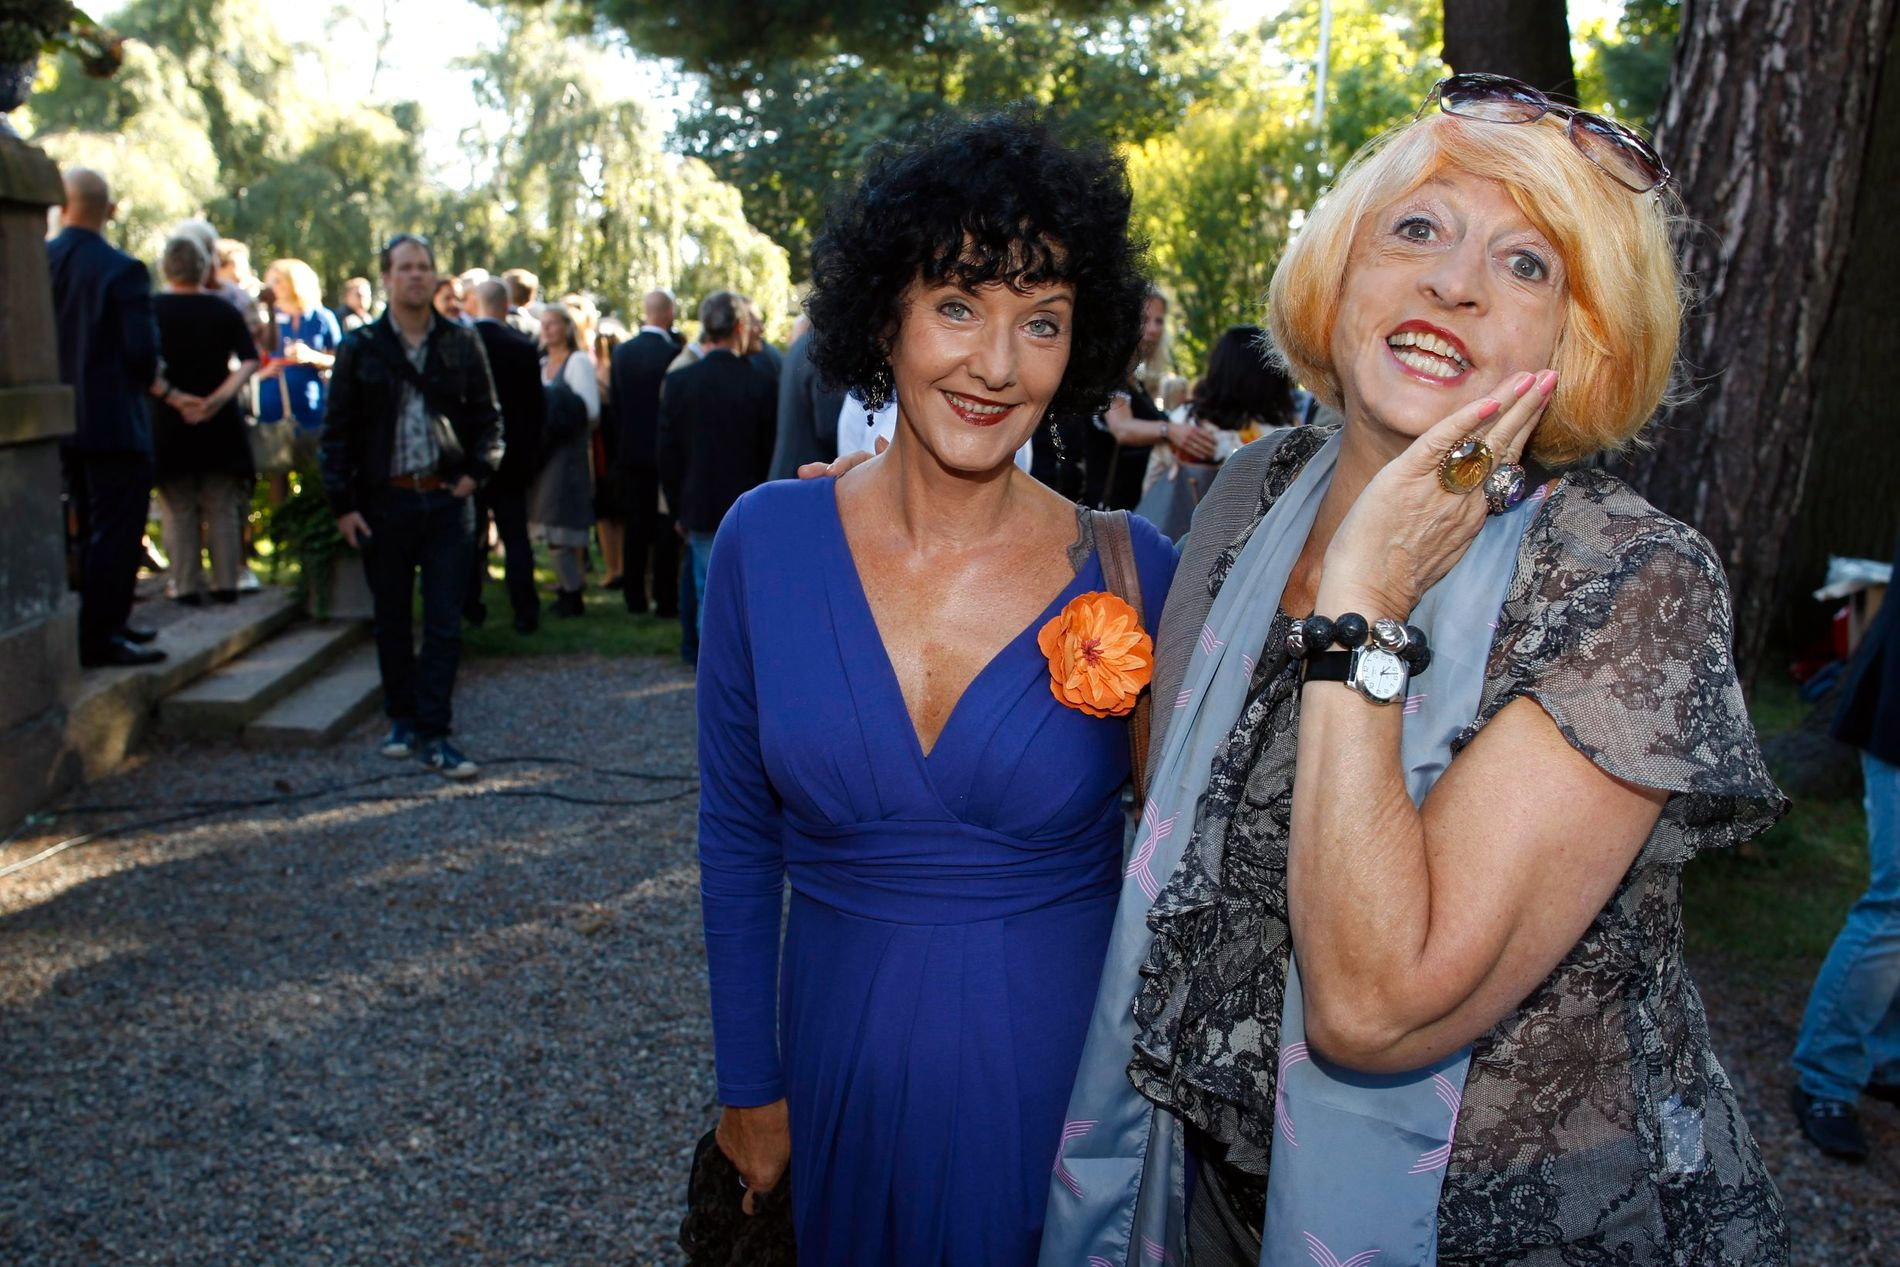 I FESTLIG LAG: Astrid Gunnestad (t.h) her sammen med Unni Lundell på Aschehougs hagefest i 2012.